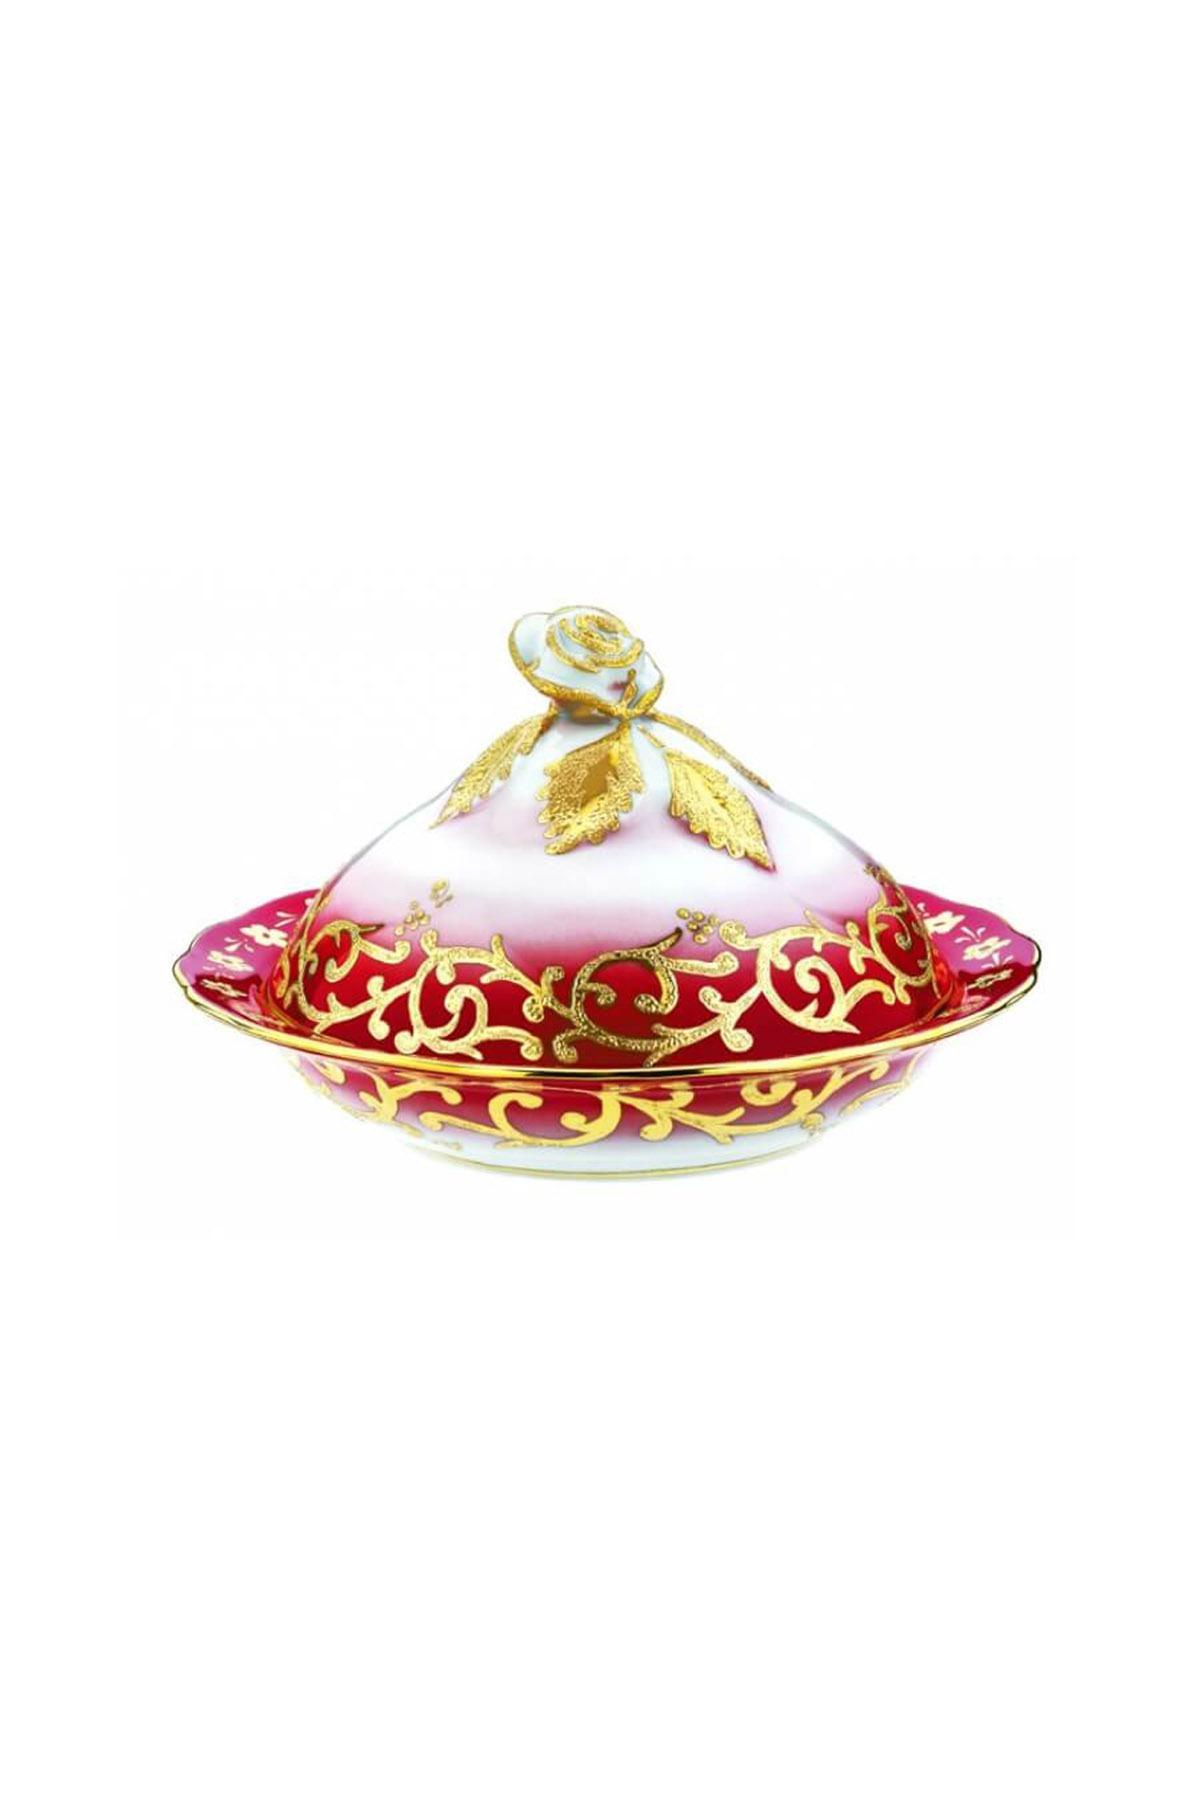 Kütahya Porselen - Kütahya Porselen Sultan 20 Cm Şekerlik 3678